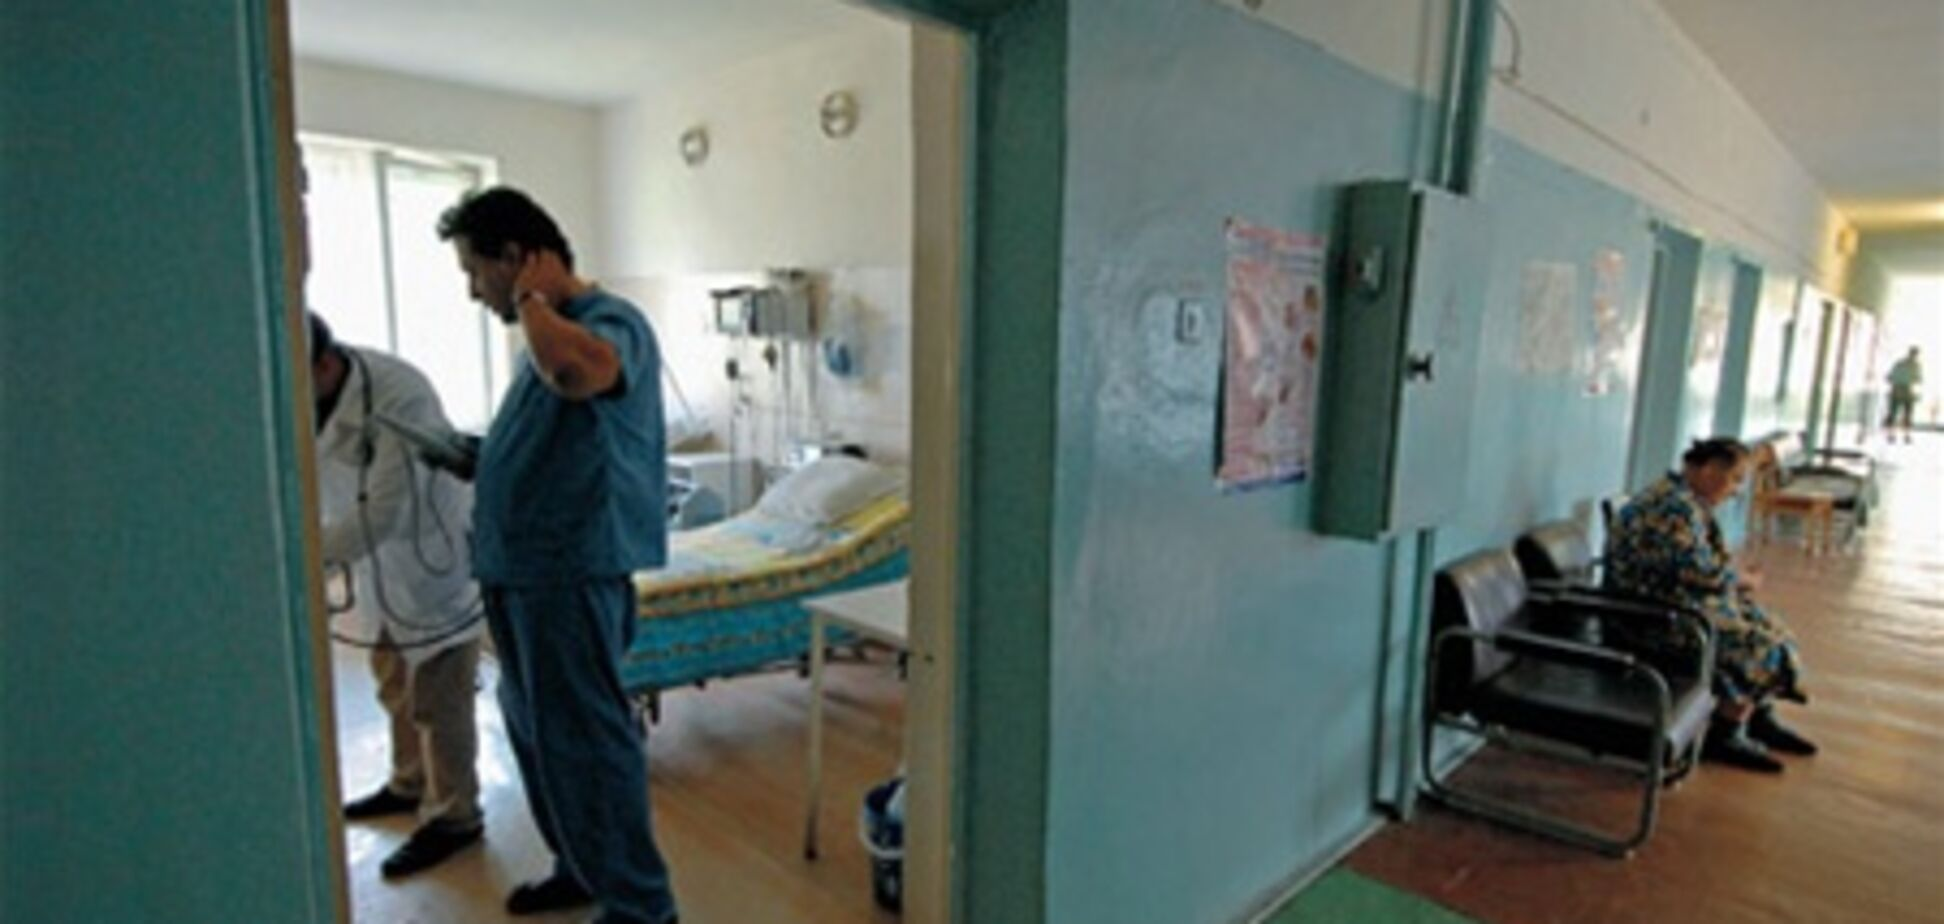 У севастопольській лікарні обірвався ліфт з пацієнтами